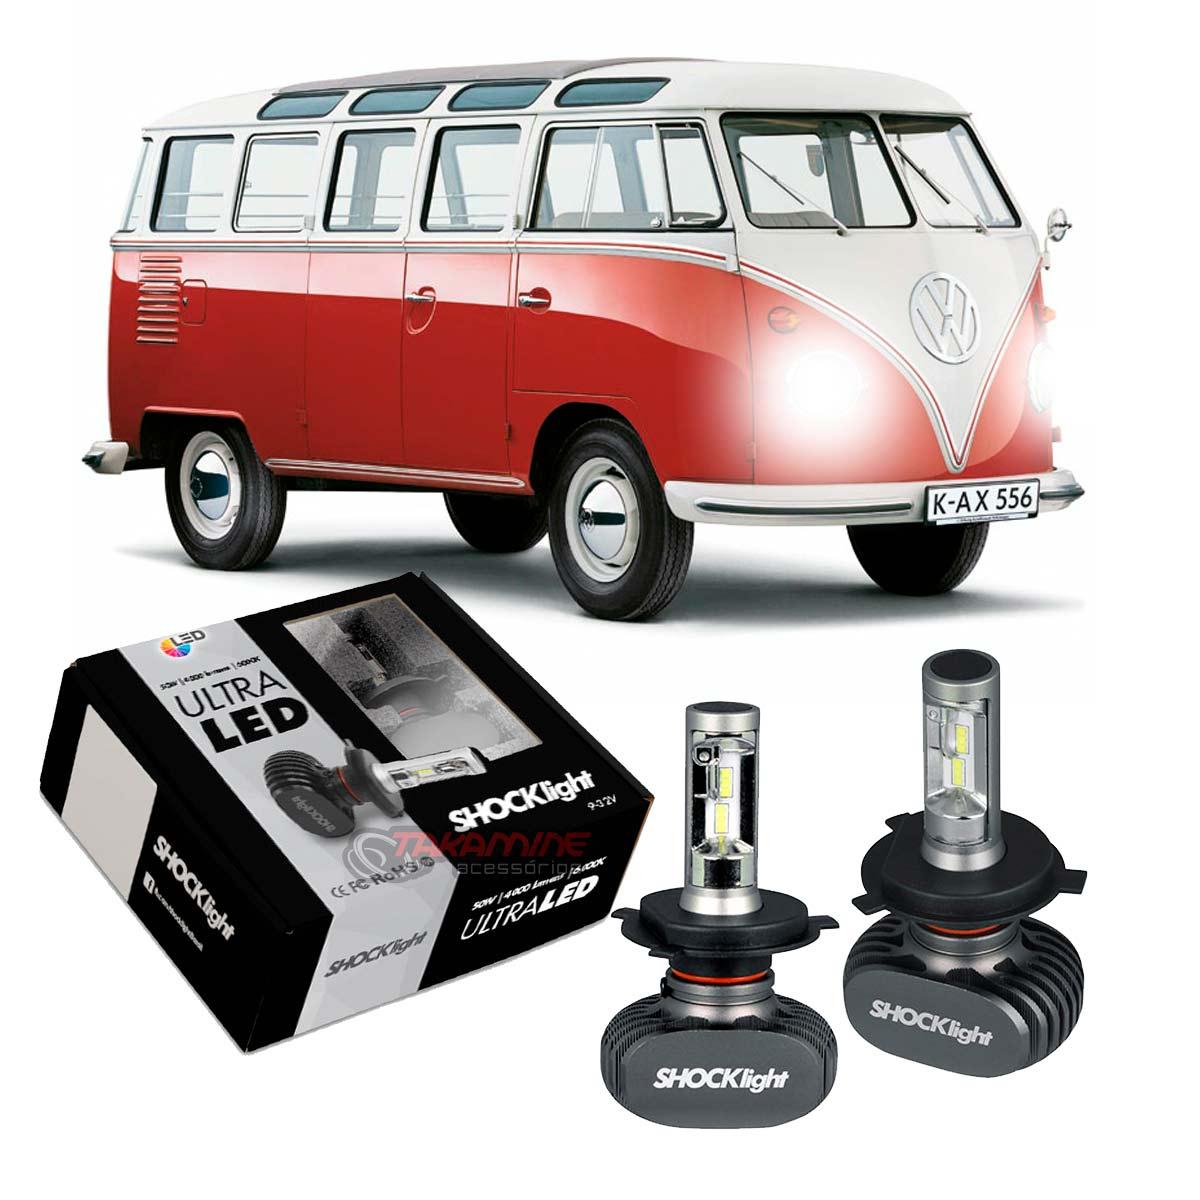 Kit Ultra LED Kombi 1958 até 2013 tipo xenon farol alto e baixo H4 50W